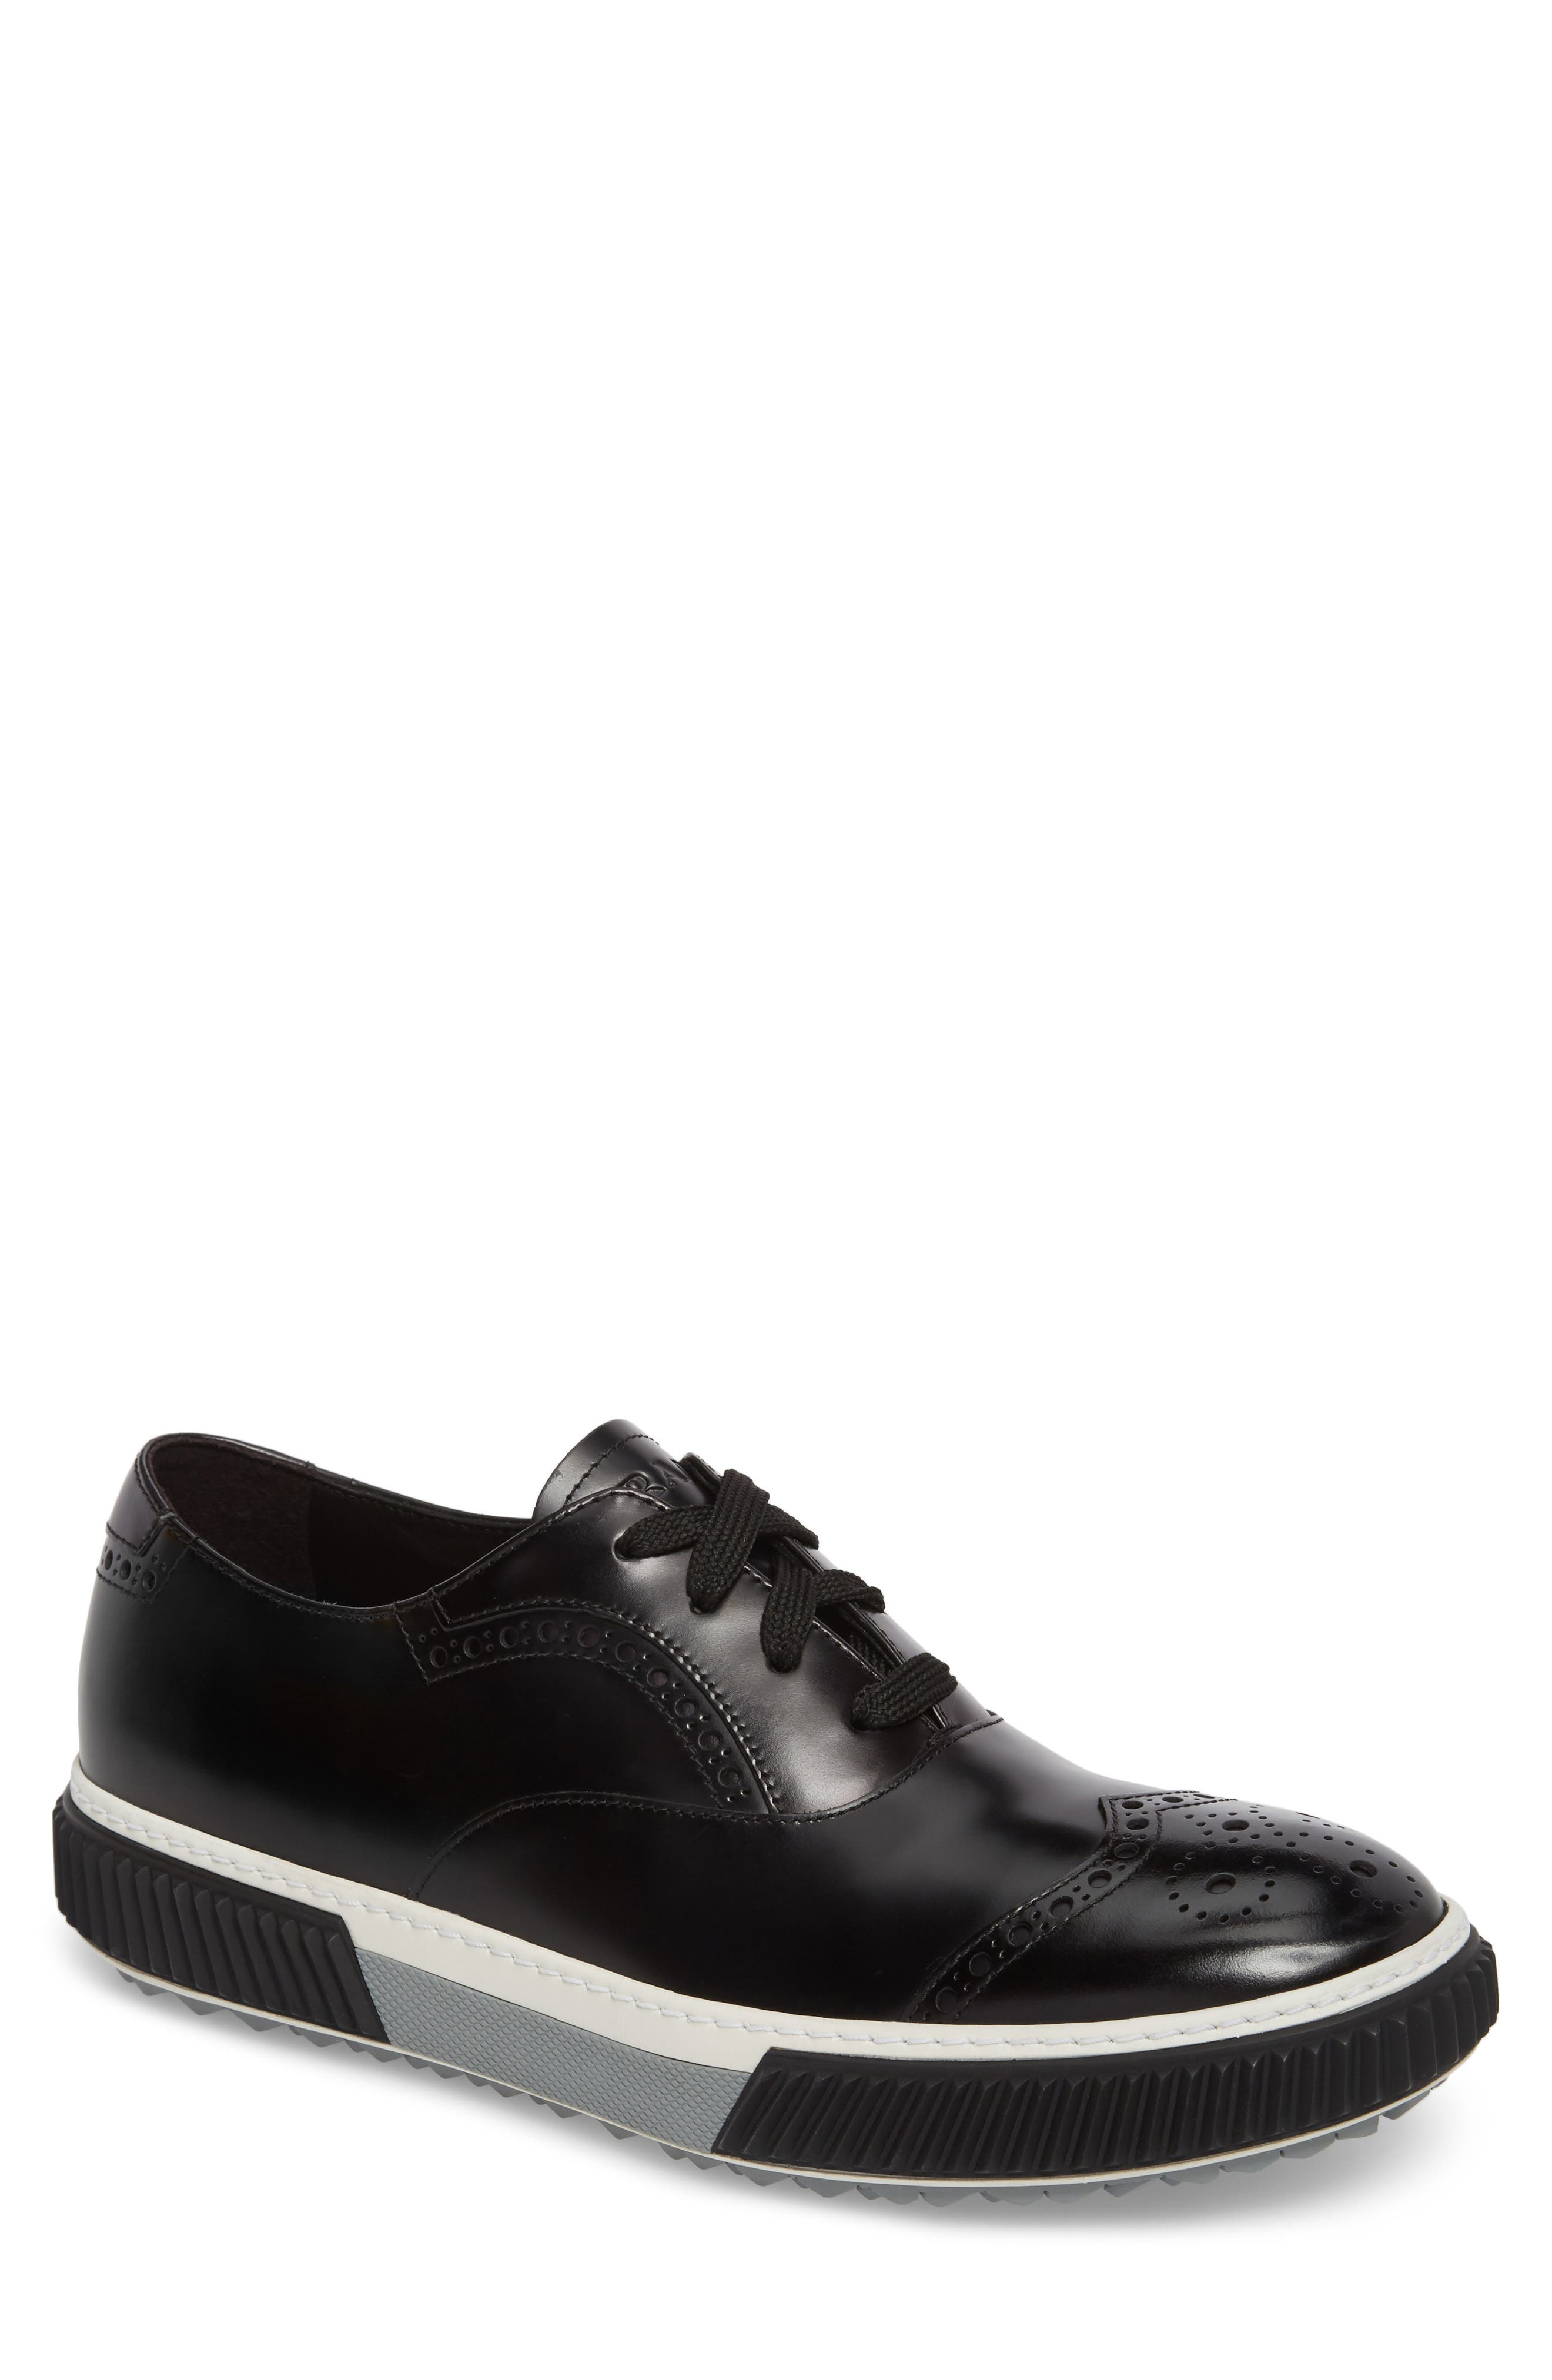 Linea Rossa Wingtip Sneaker,                             Main thumbnail 1, color,                             002